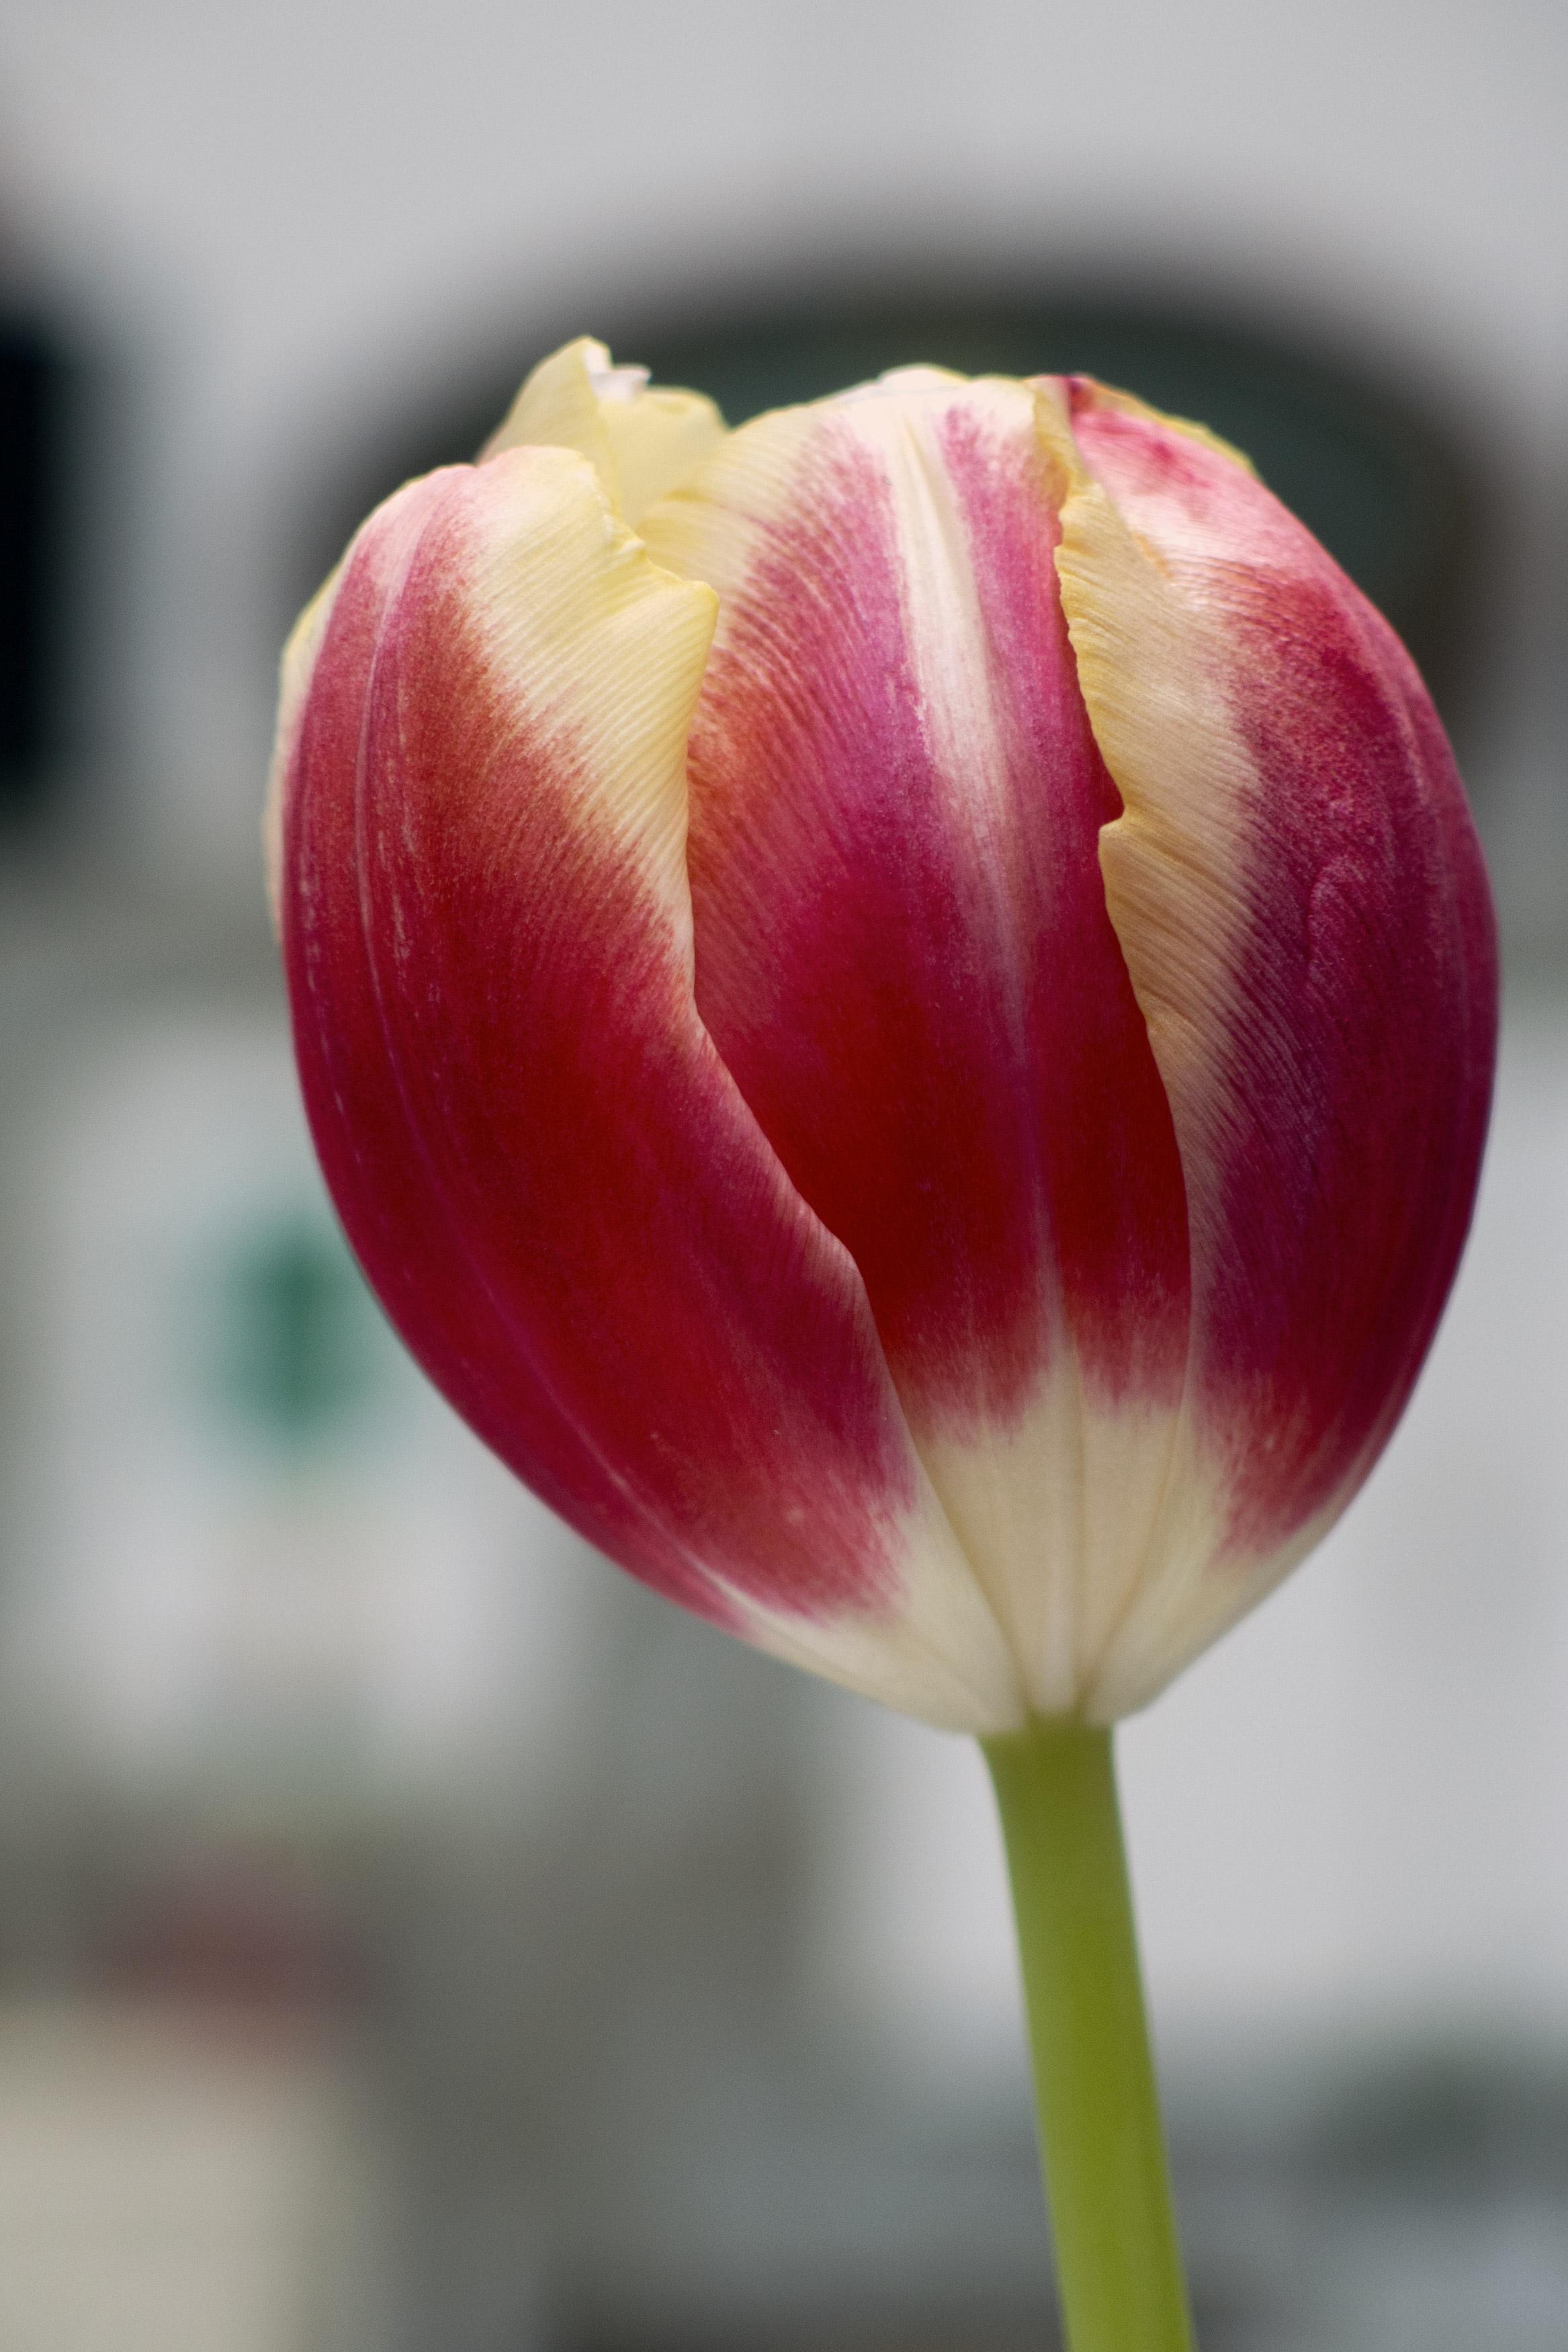 free image: tulip flower | libreshot public domain photos